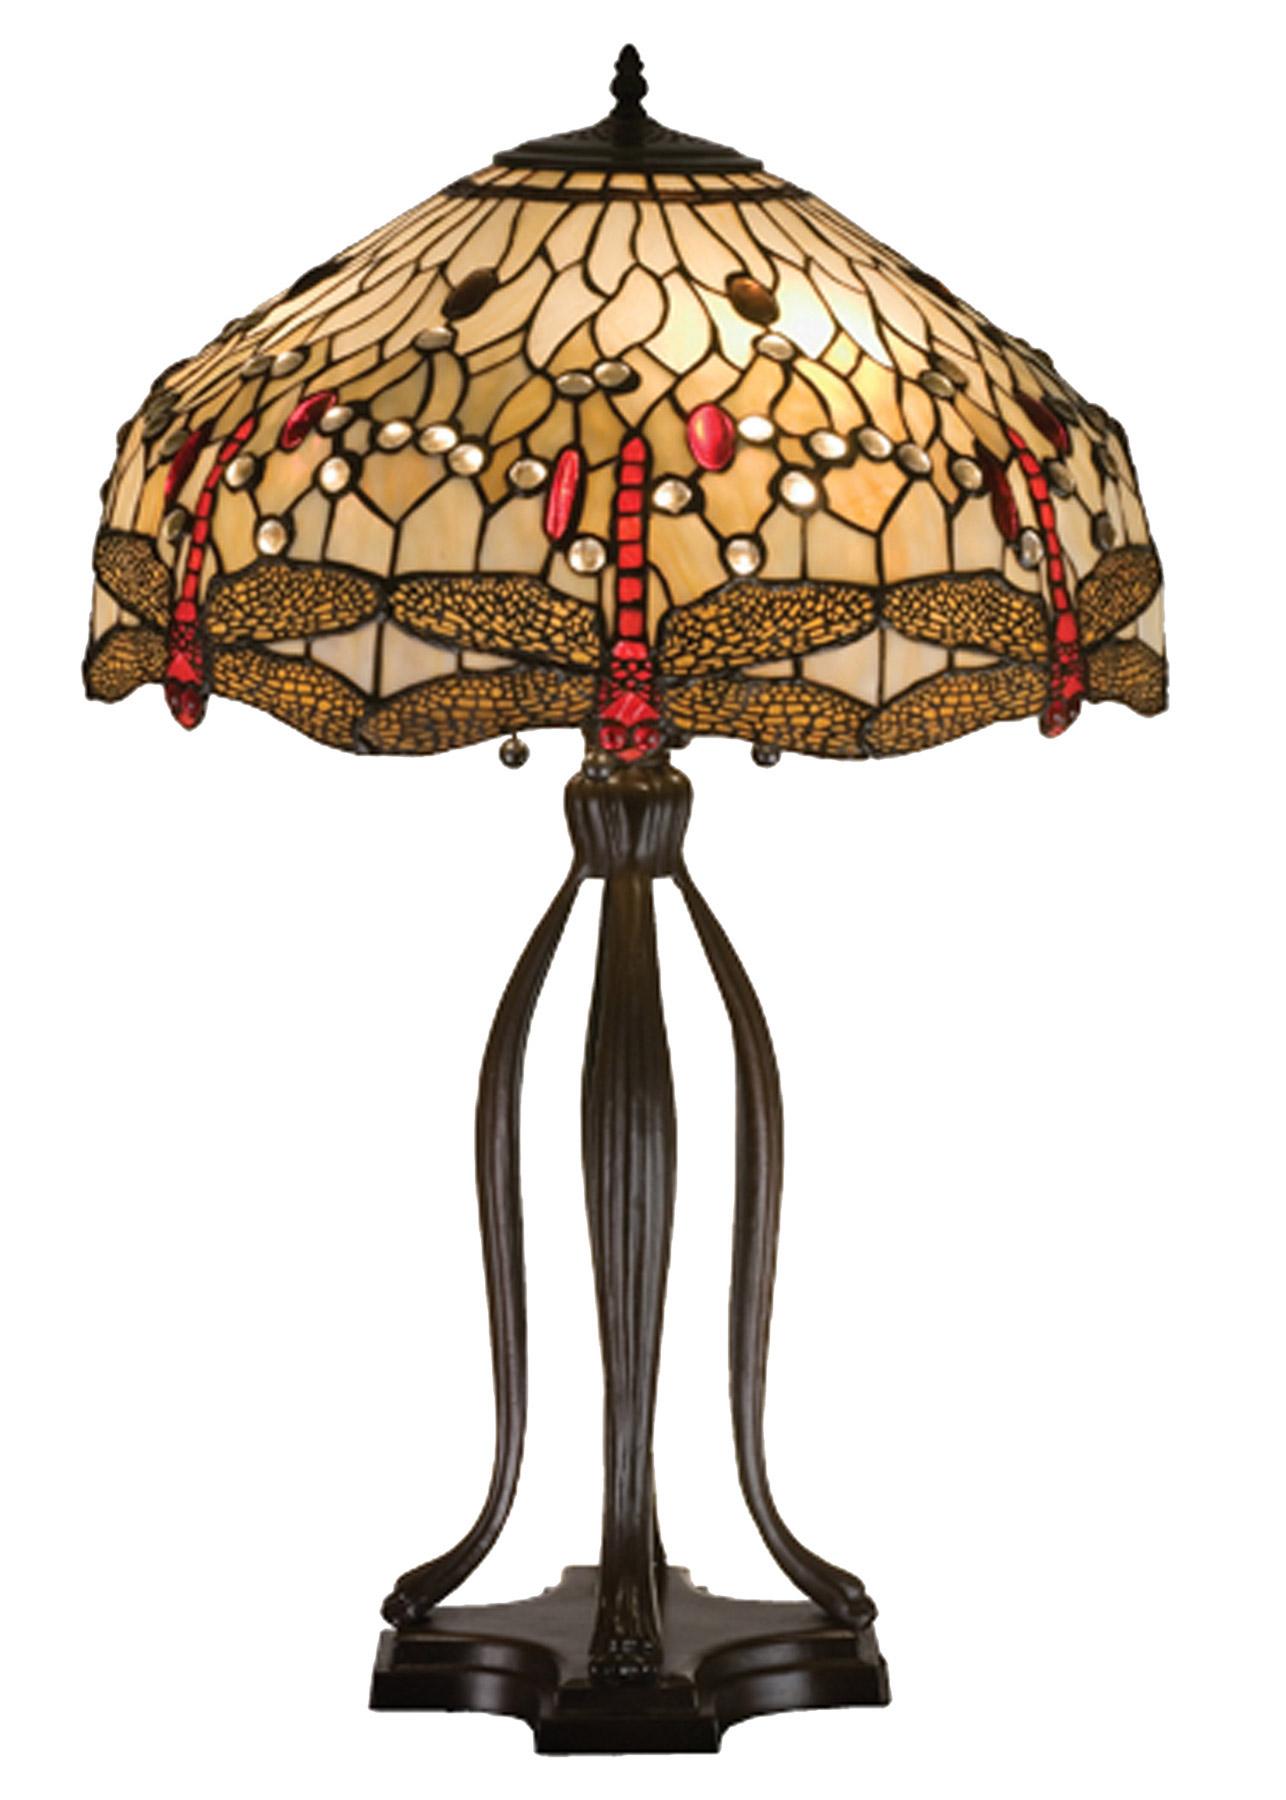 Meyda 17500 Tiffany Dragonfly Table Lamp